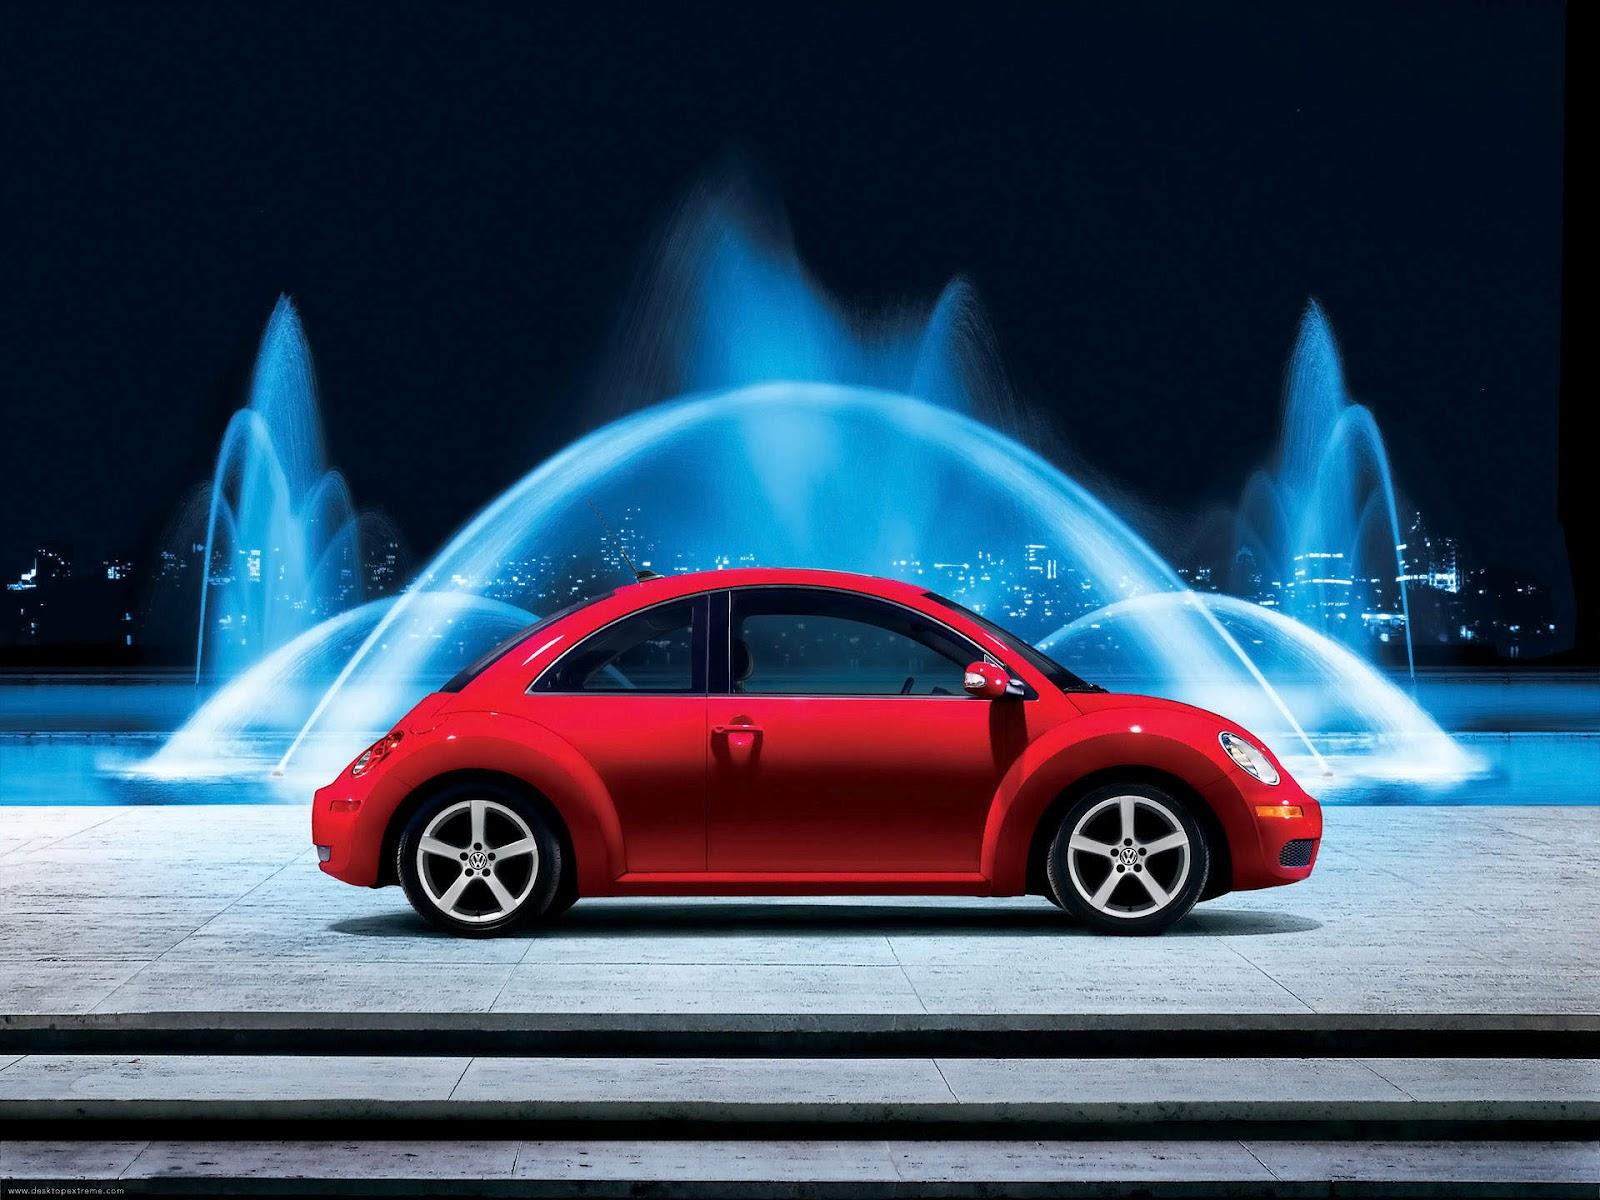 http://3.bp.blogspot.com/-z9UklIFK5Jk/T6QspvzgUEI/AAAAAAAAKEE/dolfyHZrlTY/s1600/Volkswagen_New_Beetle_Wallpaper.jpg